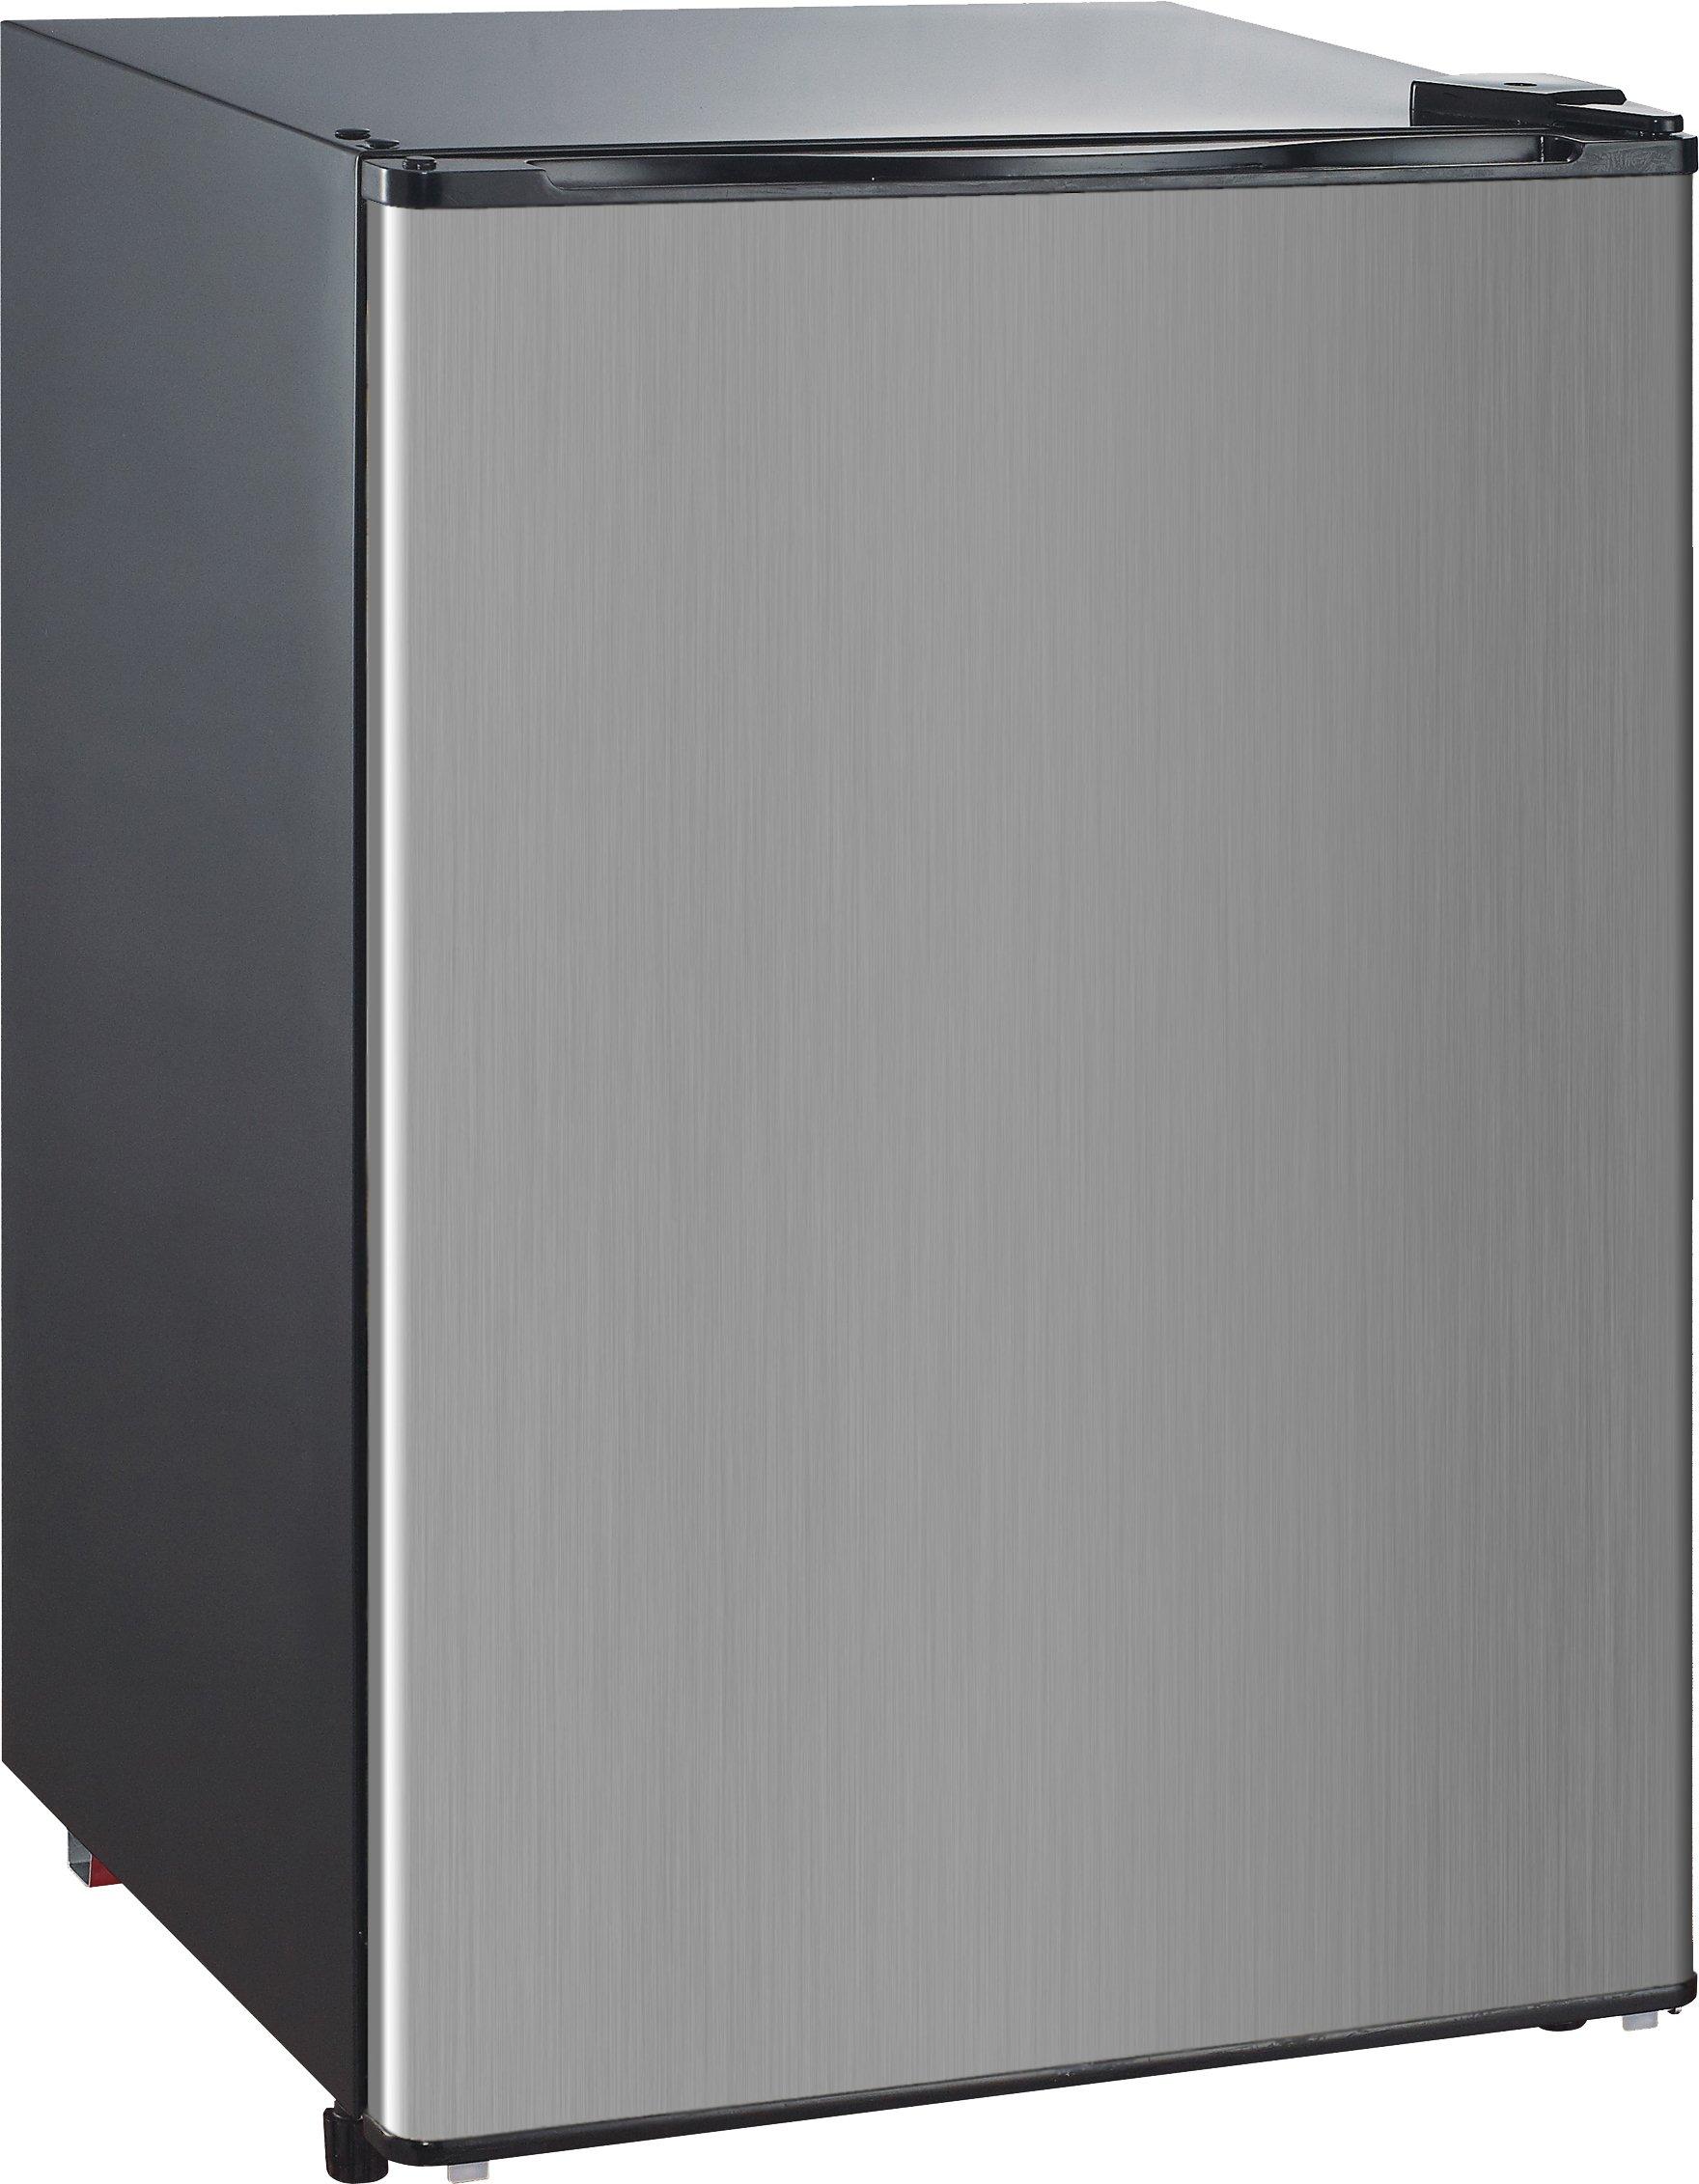 RCA-Igloo 4.6 Cubic Foot Fridge, Stainless Steel